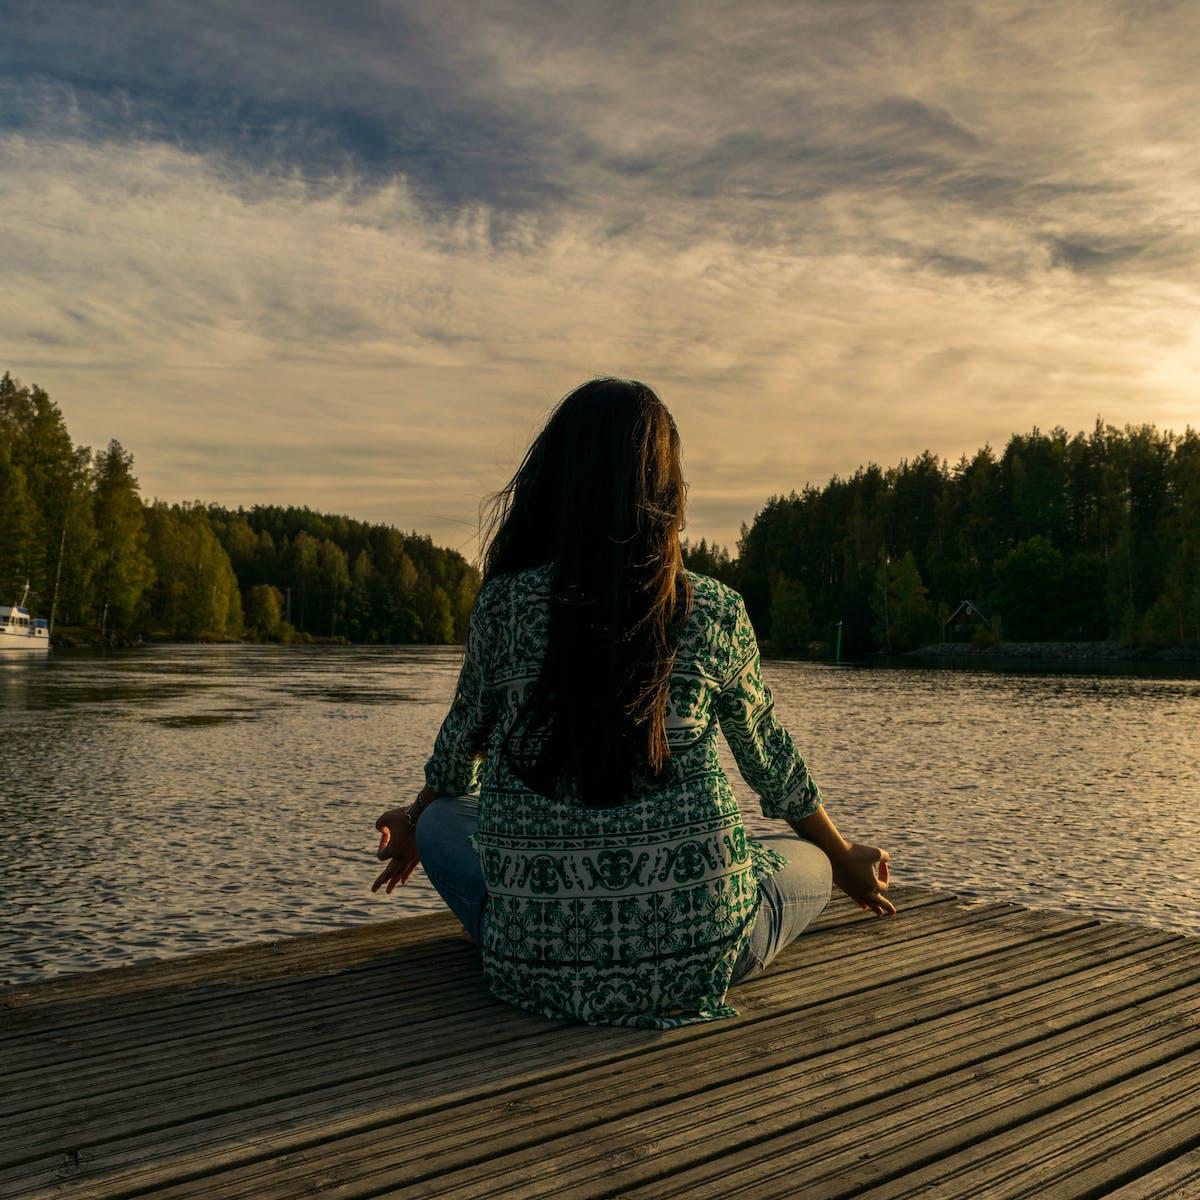 Titelbild-Digitale-Ethik-Frau-Yoga-Entspannung-See-Meditation-pixabay-2176668-leninscape